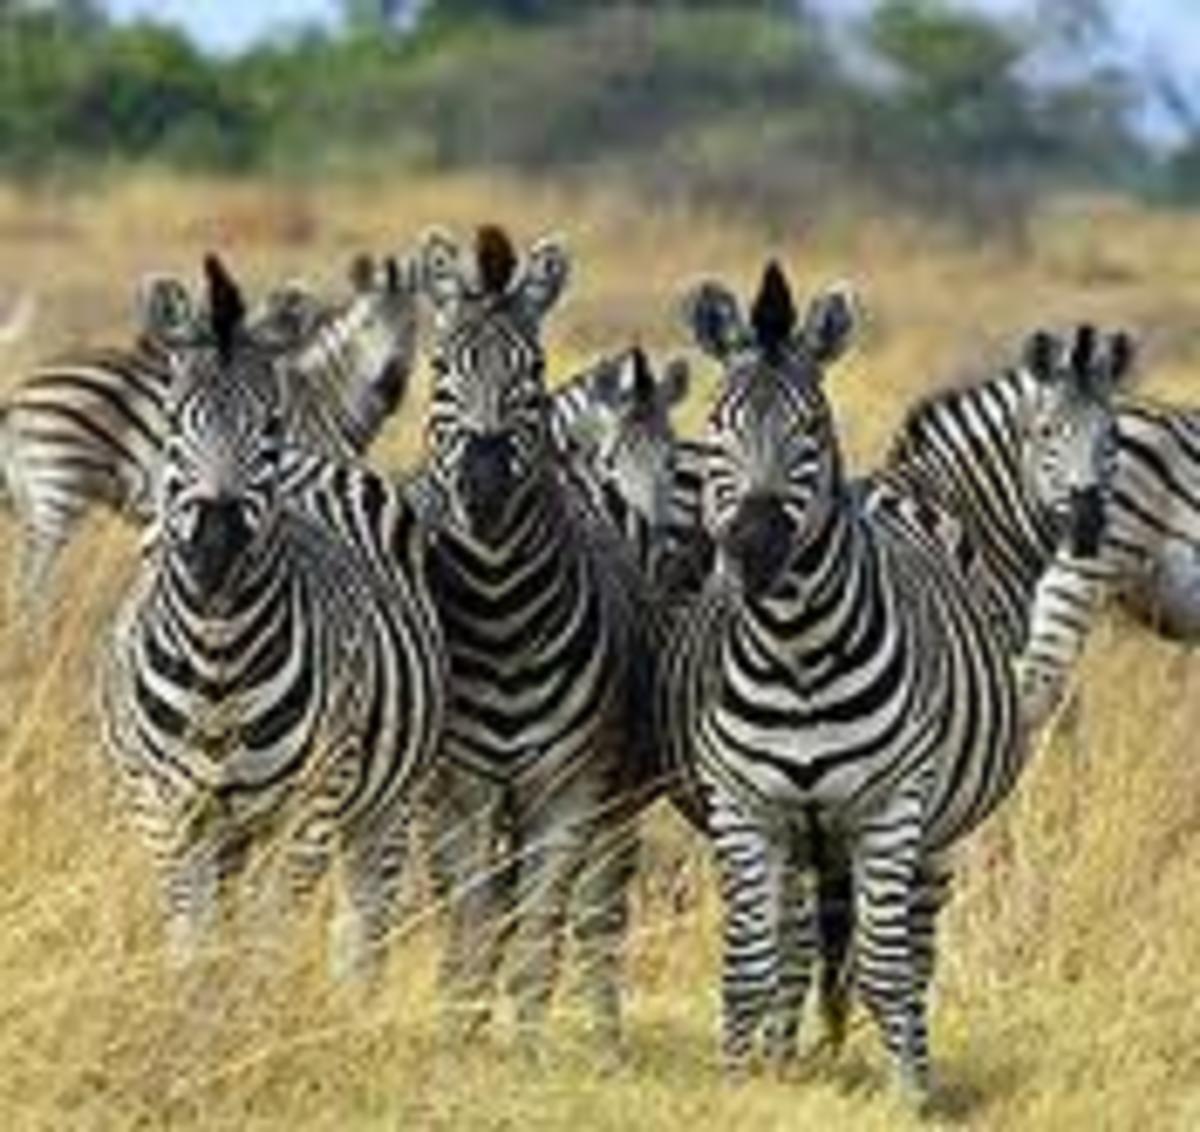 Zebra in Grass